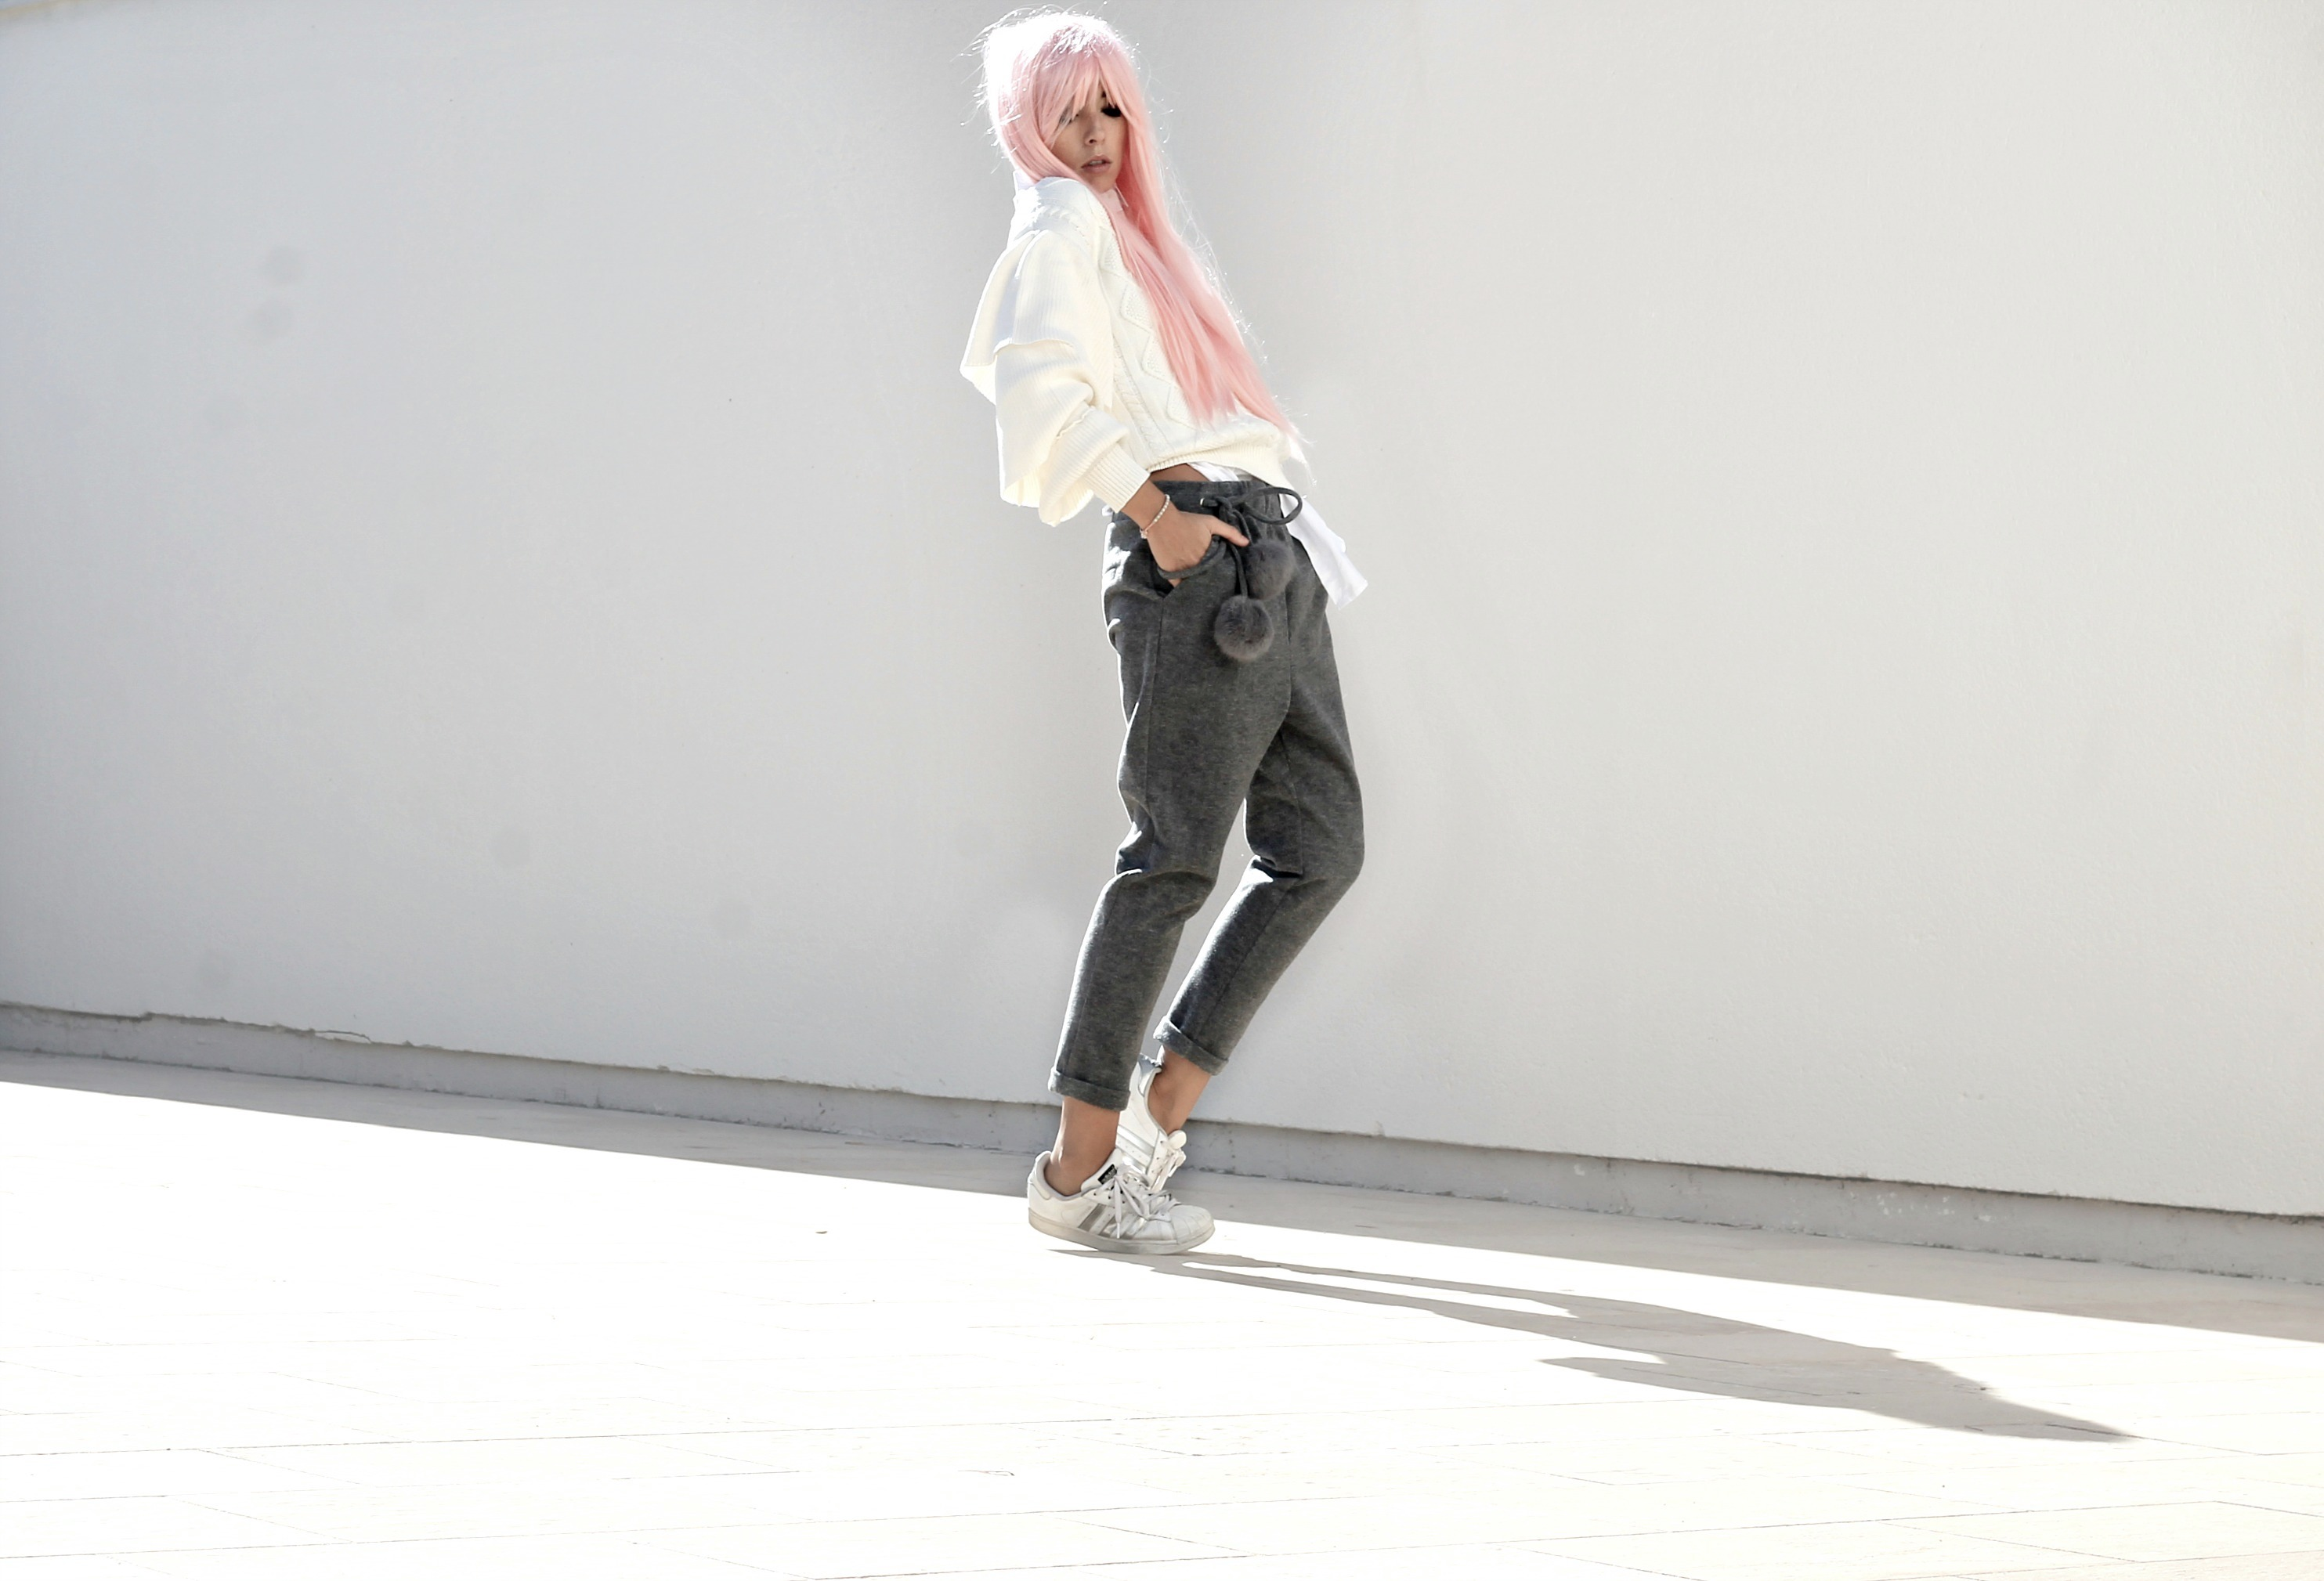 successo fast fashion, manga style blogger, capelli rosa blogger moda, casual chic look autunno inverno 2016, casual chic outfit blogger fall winter 2016, theladycracy.it, elisa bellino, fashion blogger instagram 2016, fashion blogger famose 2016, fashion italiane famose 2016, fashion blogger più seguite 2016, fashion blog 2016, fashion blogger italia 2016, fashion blogger outfit autunno inverno 2016, fashion blogger milano 2016, i love friday outfit, i love friday clothes, sporty chic outfit fall winter 2016, sporty chic look fall 2016, sporty chic blogger 2016, come vestirsi casual inverno 2016, come vestirsi sportive chic autunno inverno 2016, cosa va di moda inverno 2016,